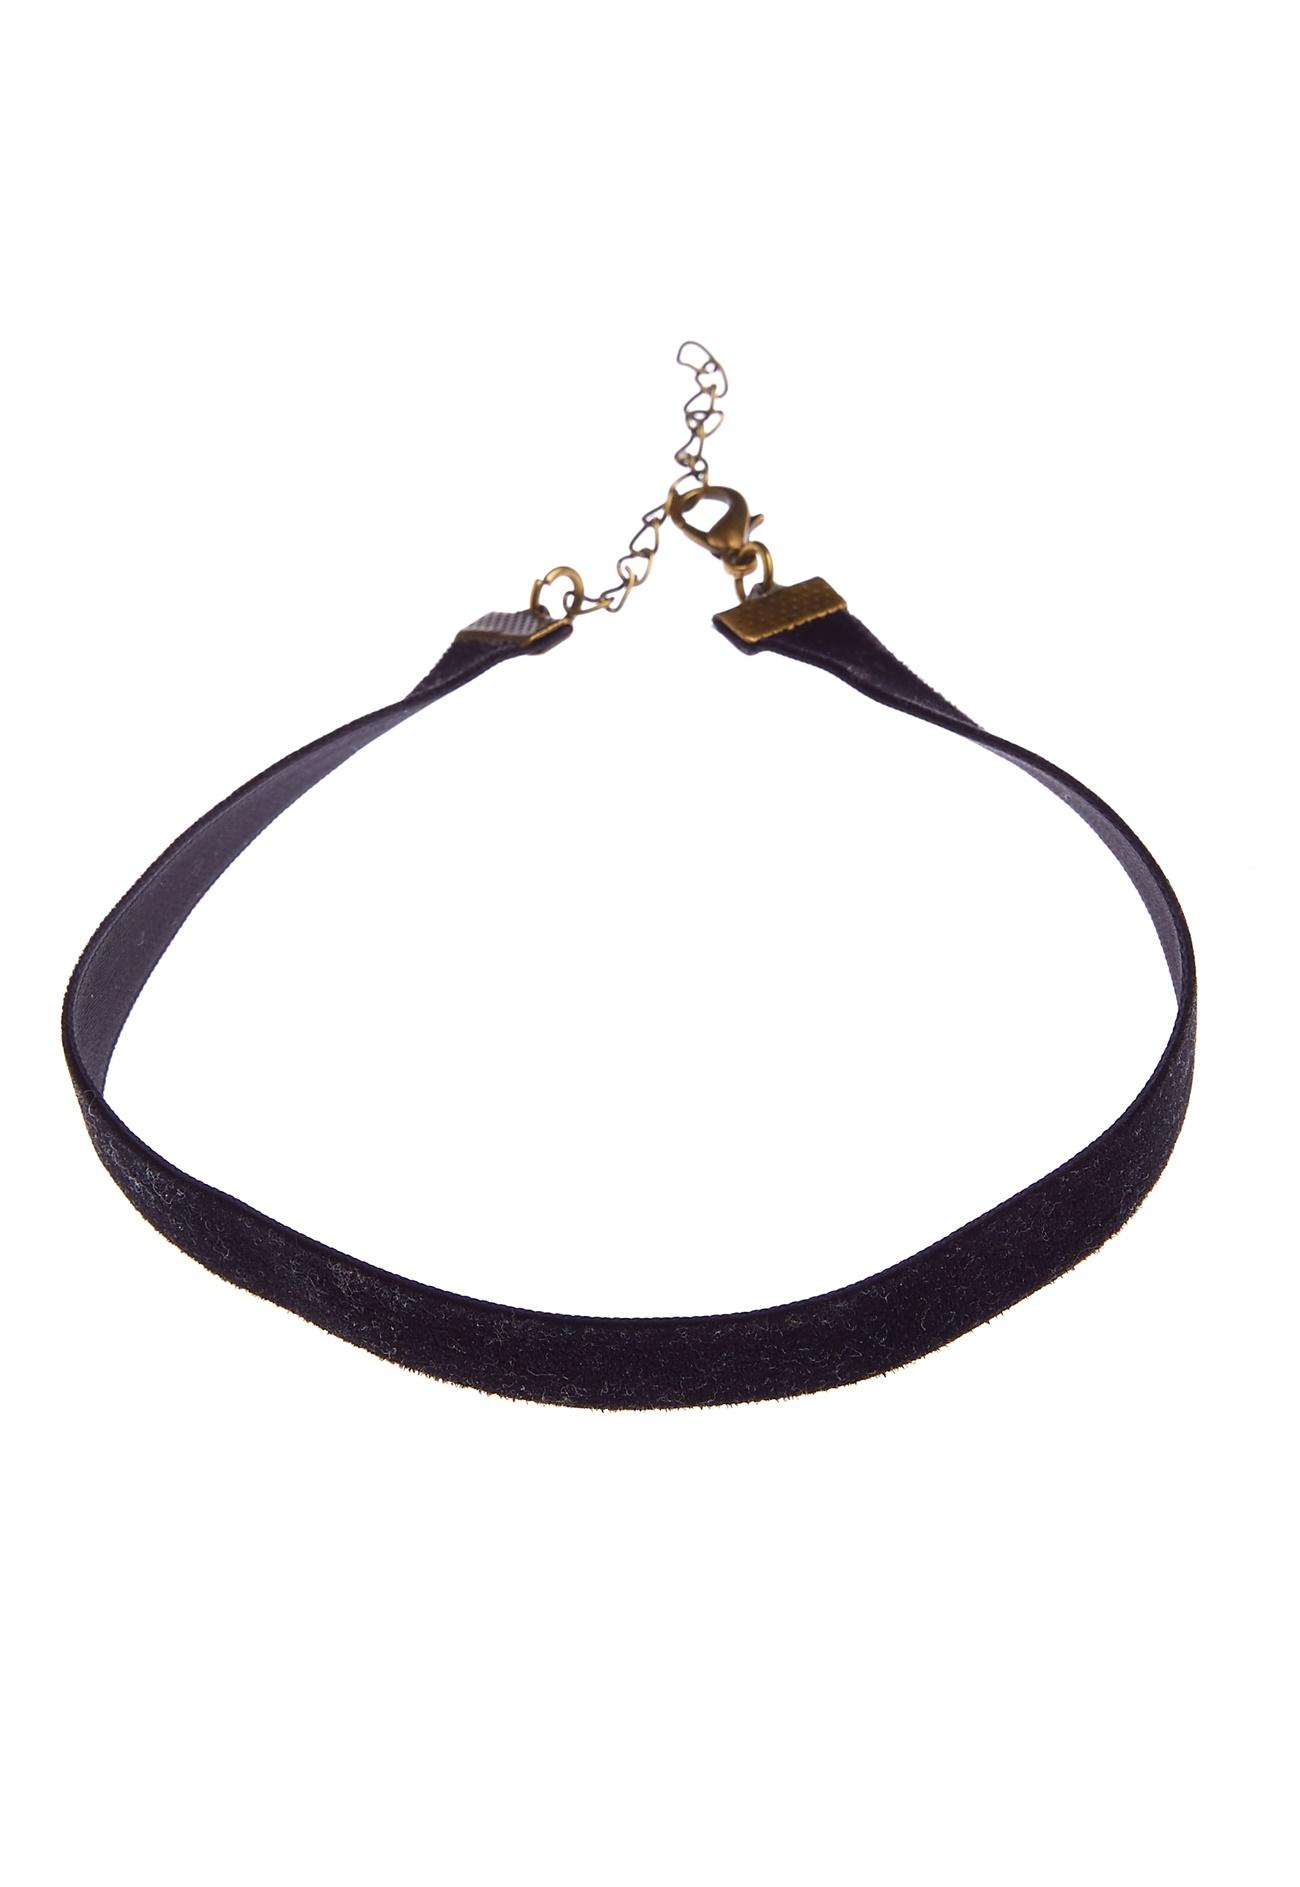 77thflea velvet choker necklace black bubbleroom